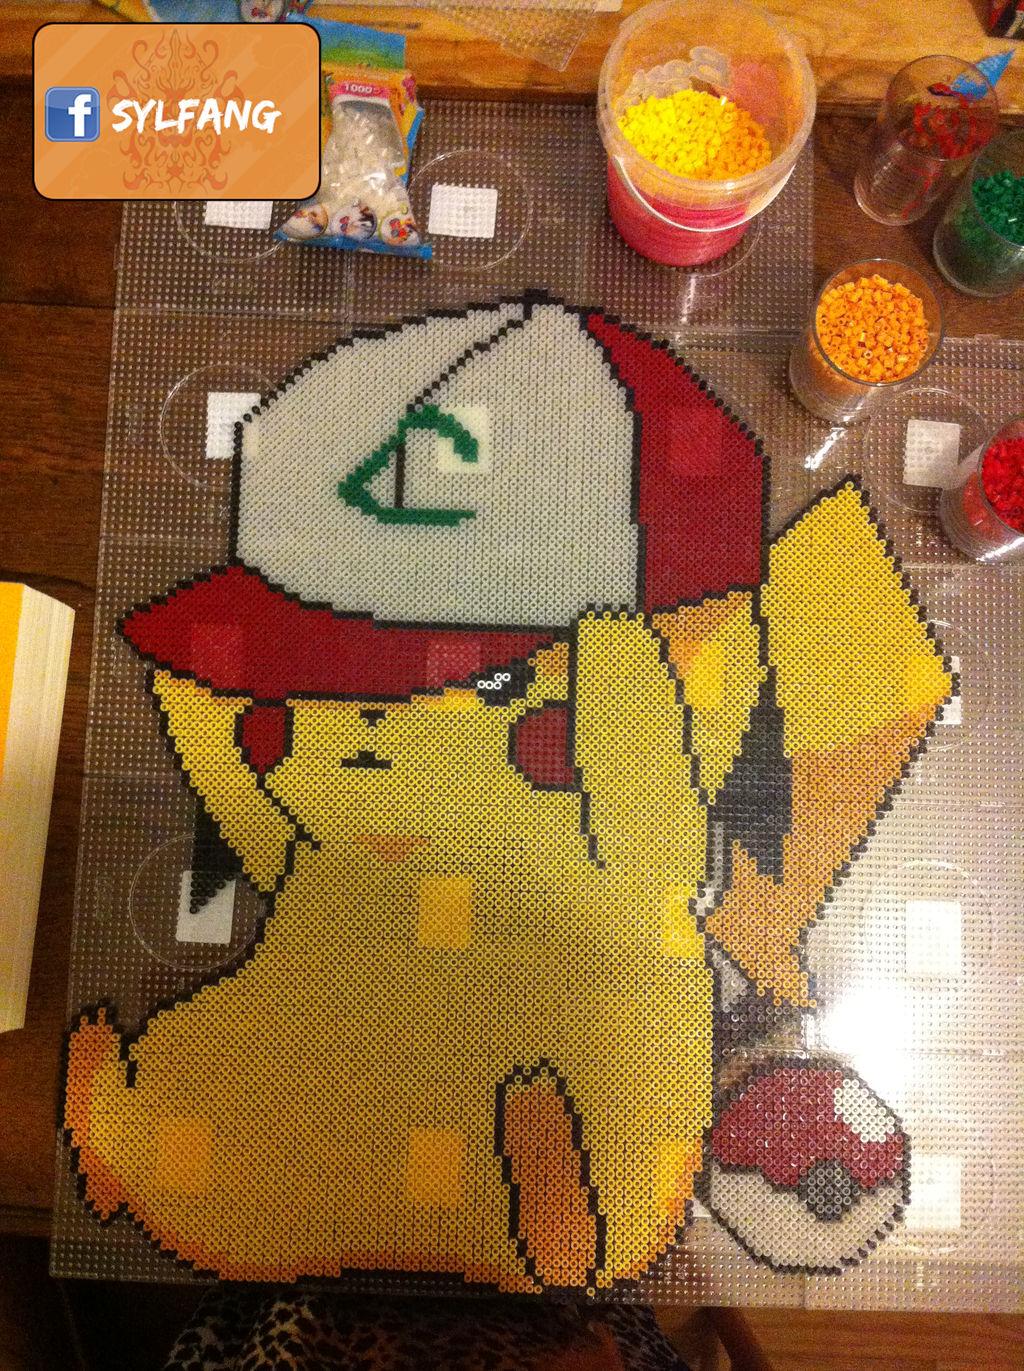 Pikachu Pixel Art Perle Hama By Sylfang On Deviantart